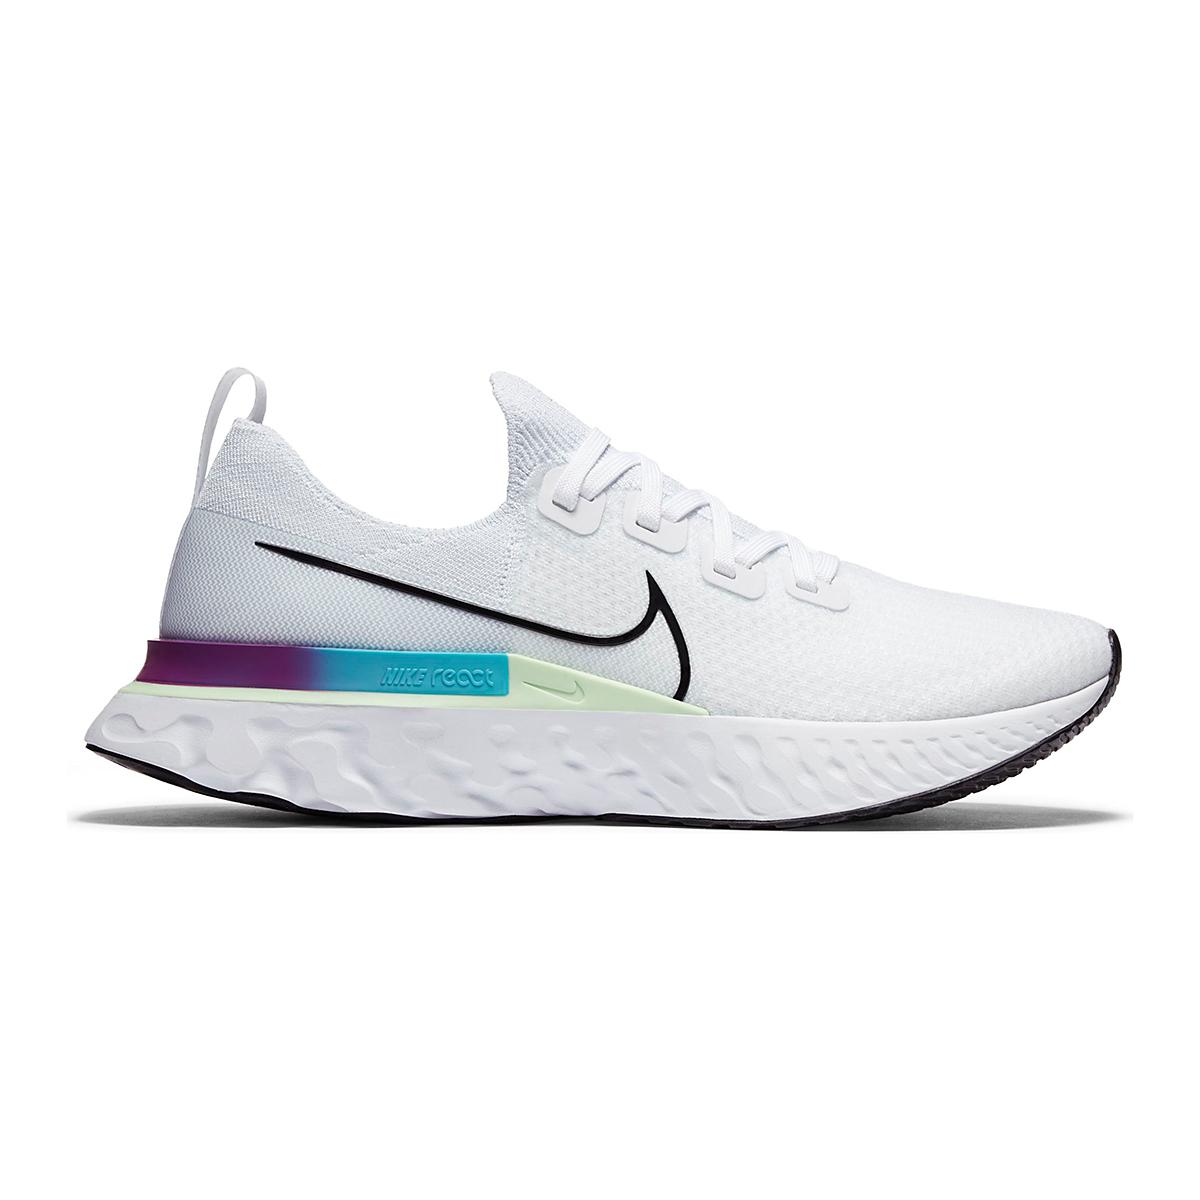 Men's Nike React Infinity Run Flyknit Running Shoes - Color: White/Vapor Green/Oracle Aqua/Black - Size: 6 - Width: Regular, White/Vapor Green/Oracle Aqua/Black, large, image 1